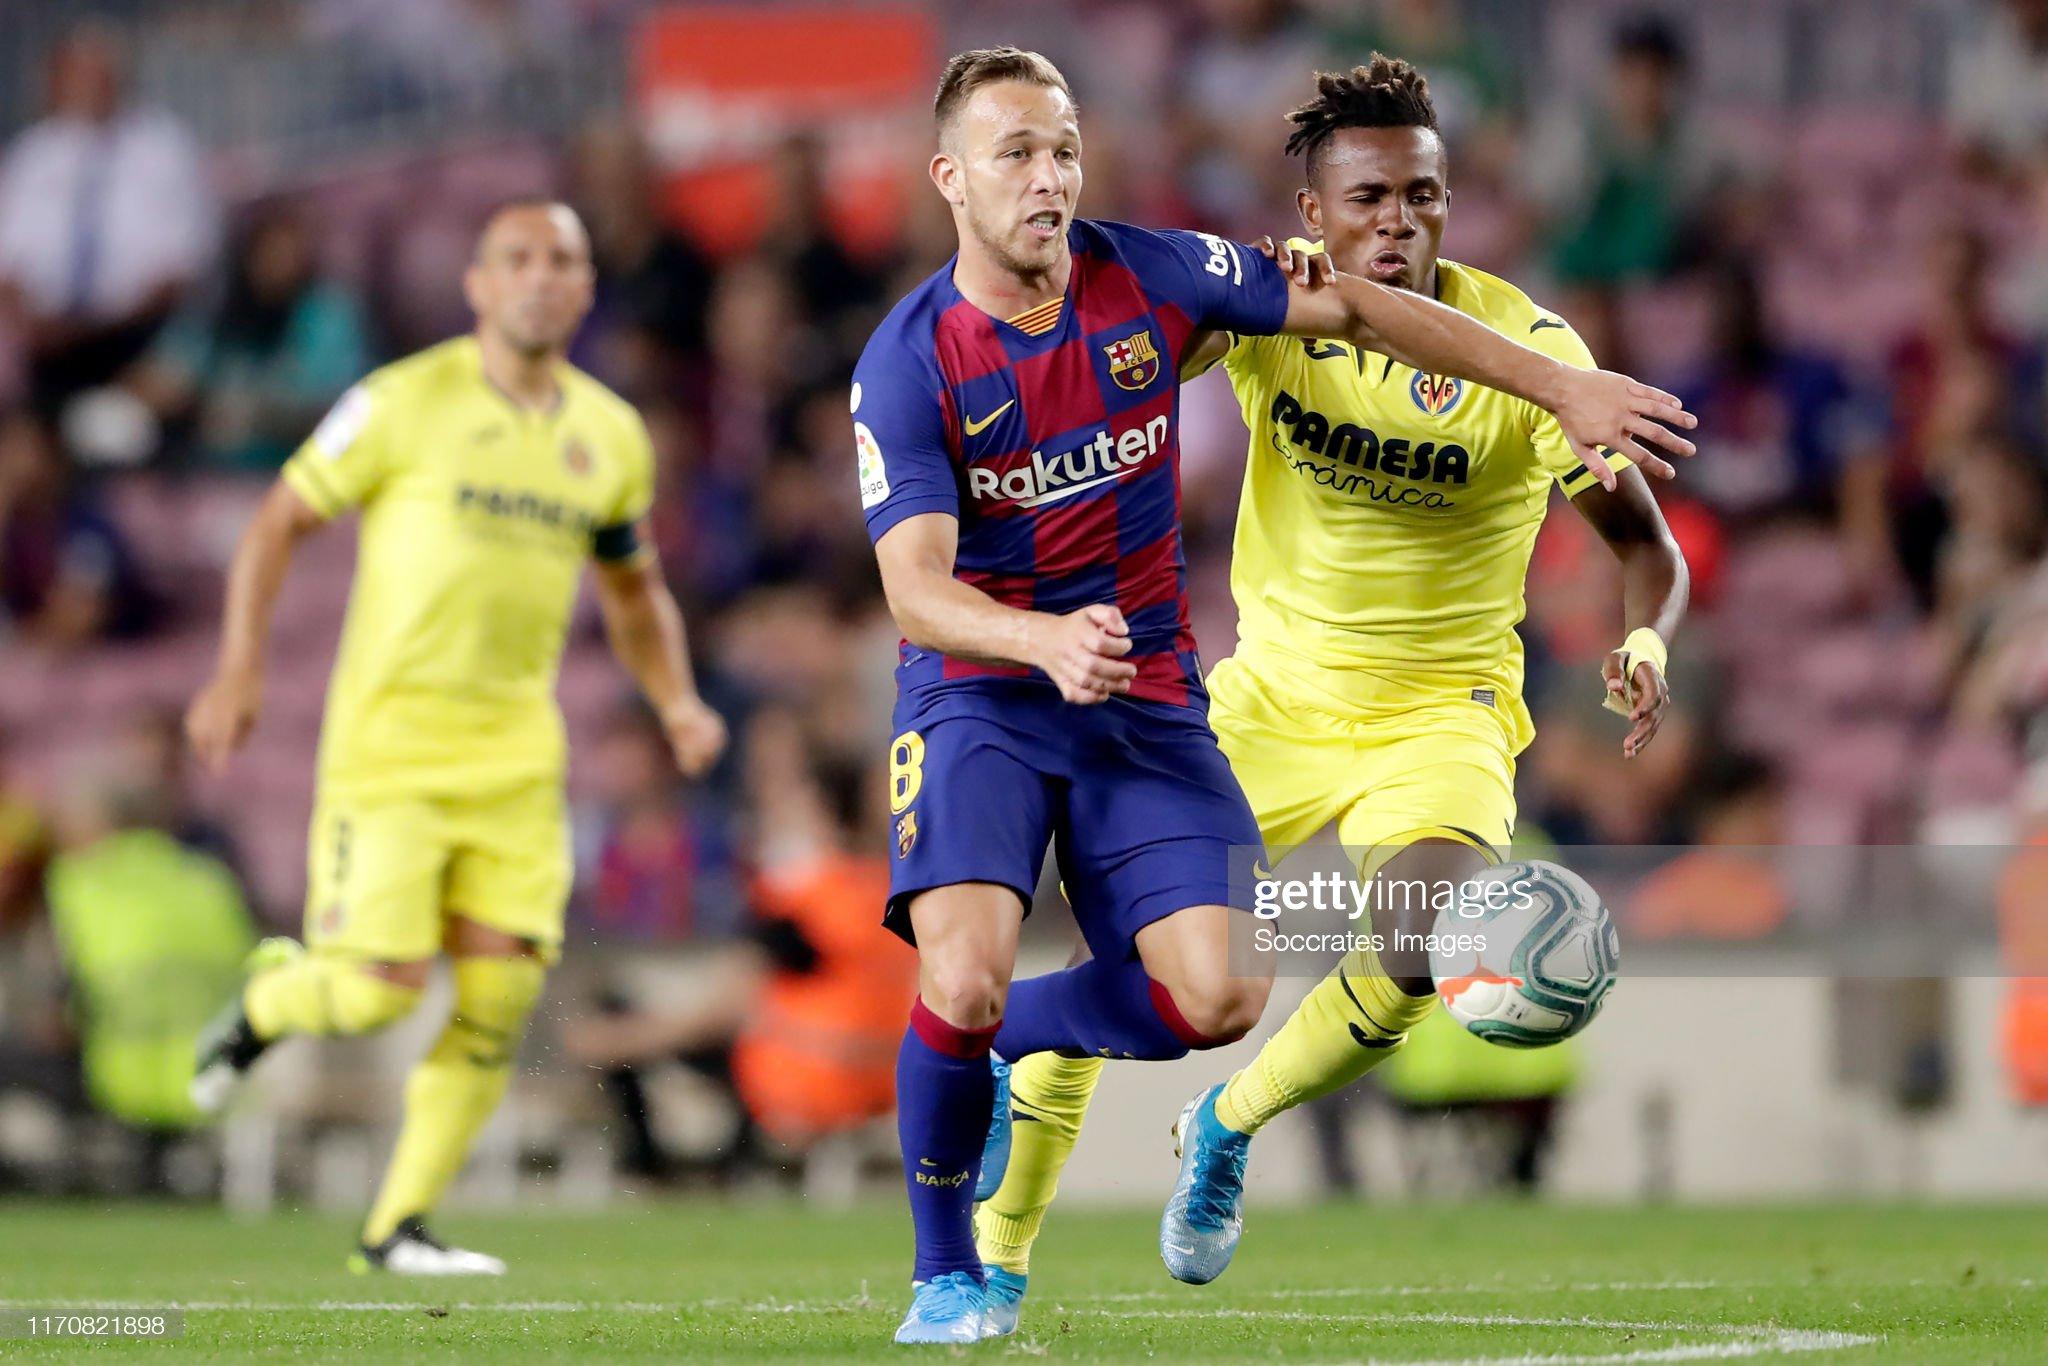 صور مباراة : برشلونة - فياريال 2-1 ( 24-09-2019 )  Arthur-of-fc-barcelona-samuel-chukwueze-of-villarreal-during-the-la-picture-id1170821898?s=2048x2048